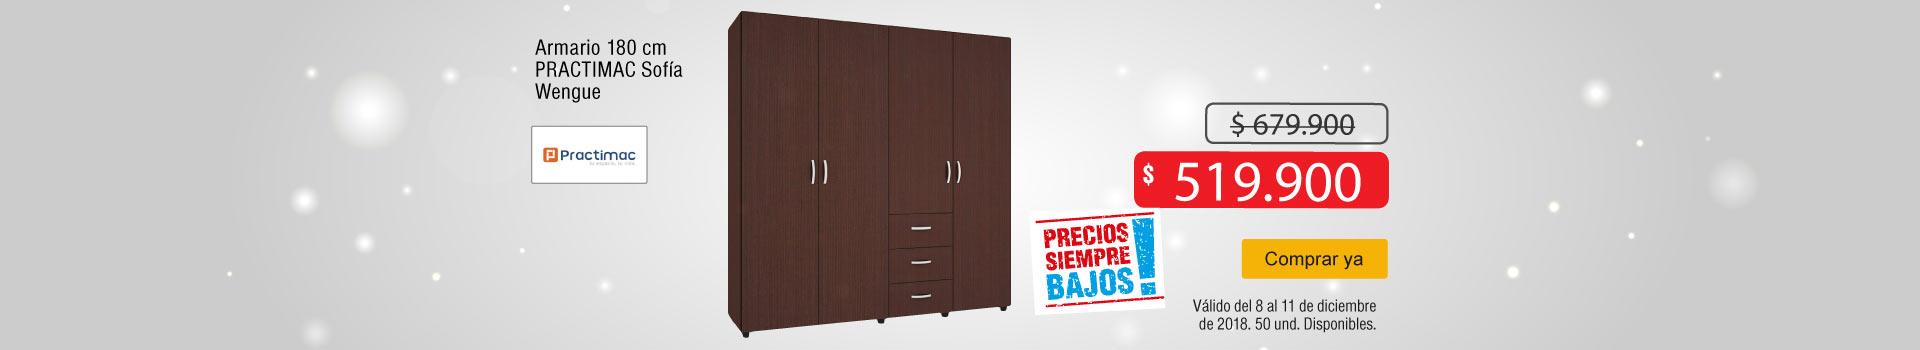 AK-BCAT-3-hogar---muebles-practimac-armario-sofia-Dic8